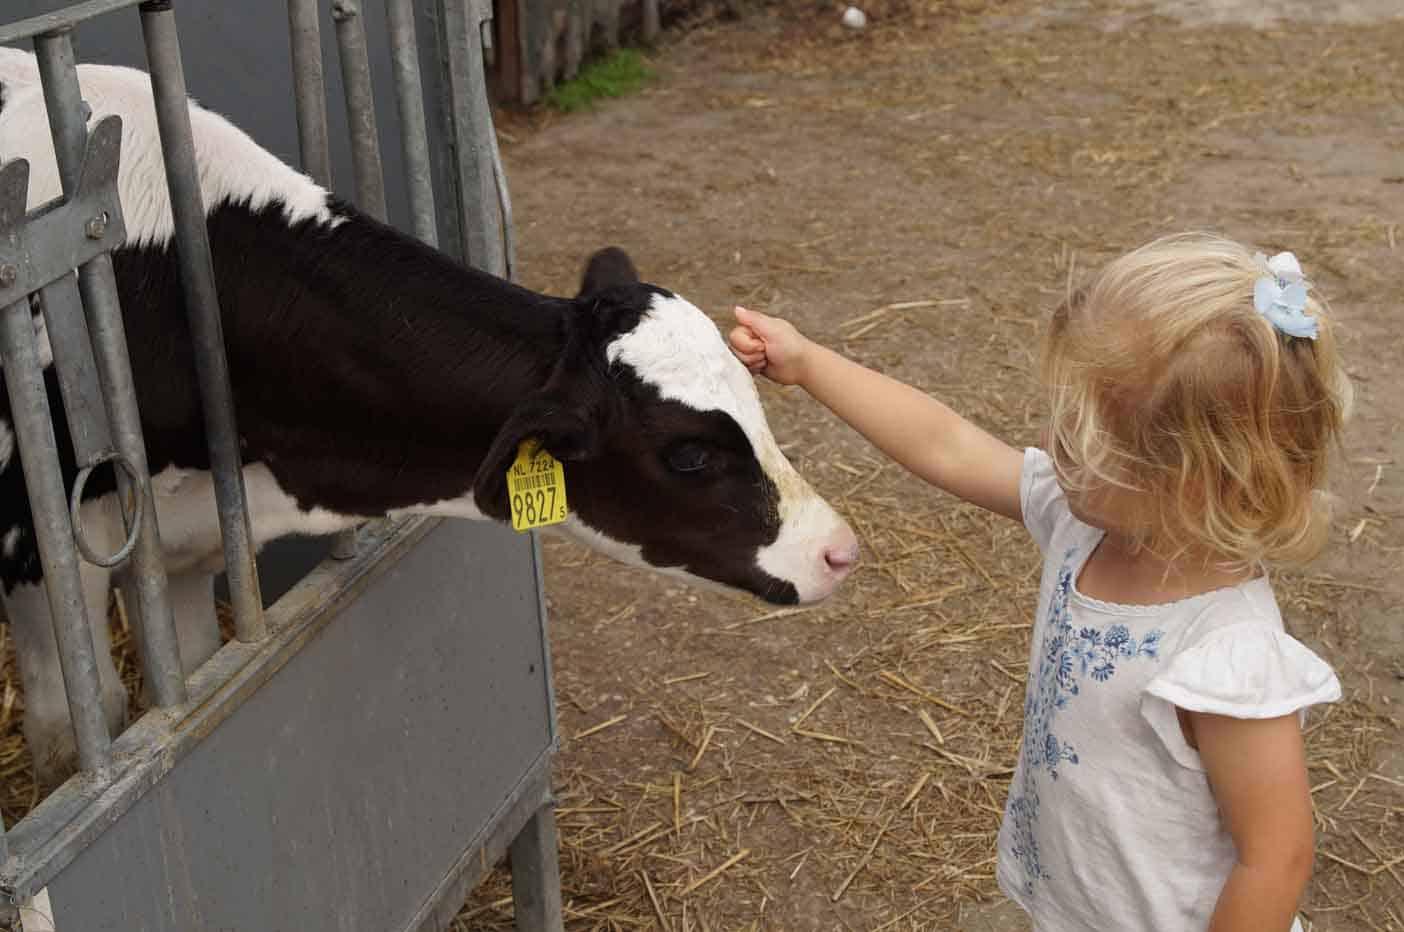 IJsboerderij Boere Iis